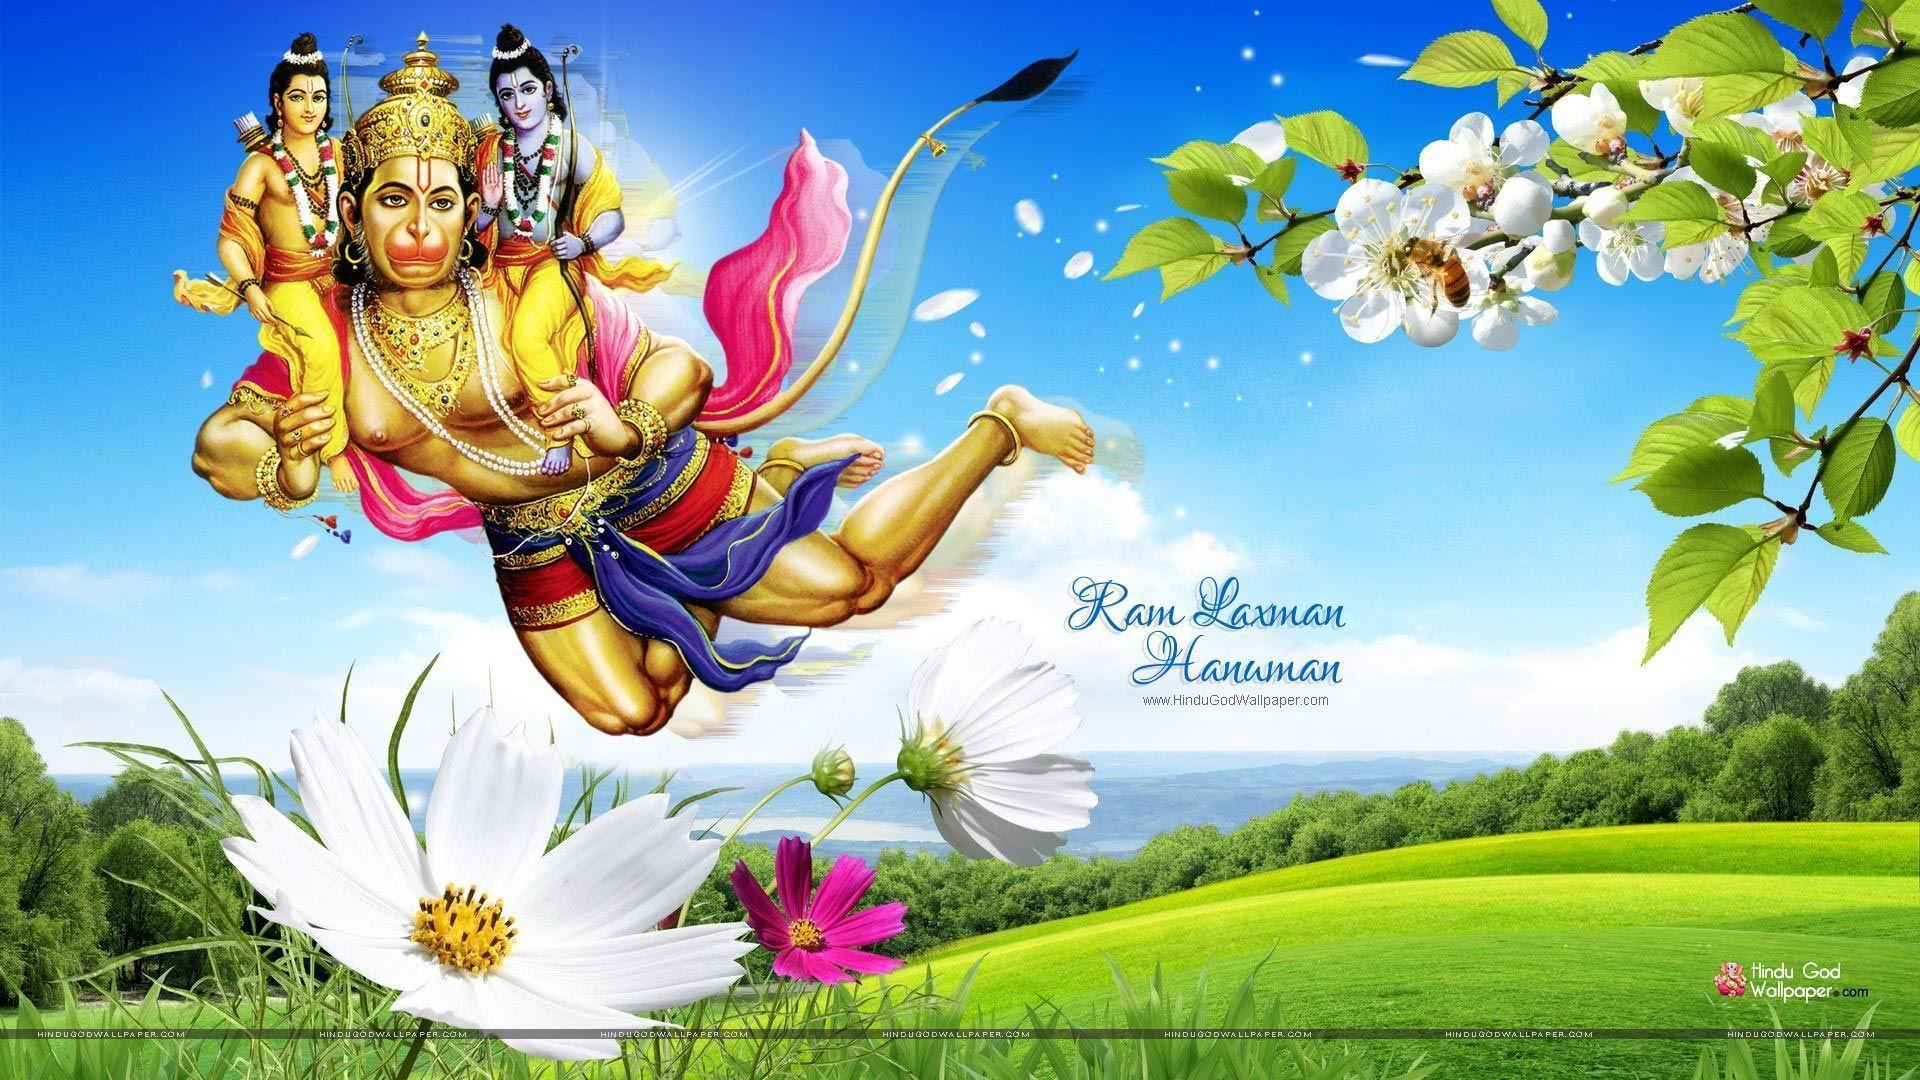 Shri Ram Laxman Hanuman HD Wallpaper Free Download